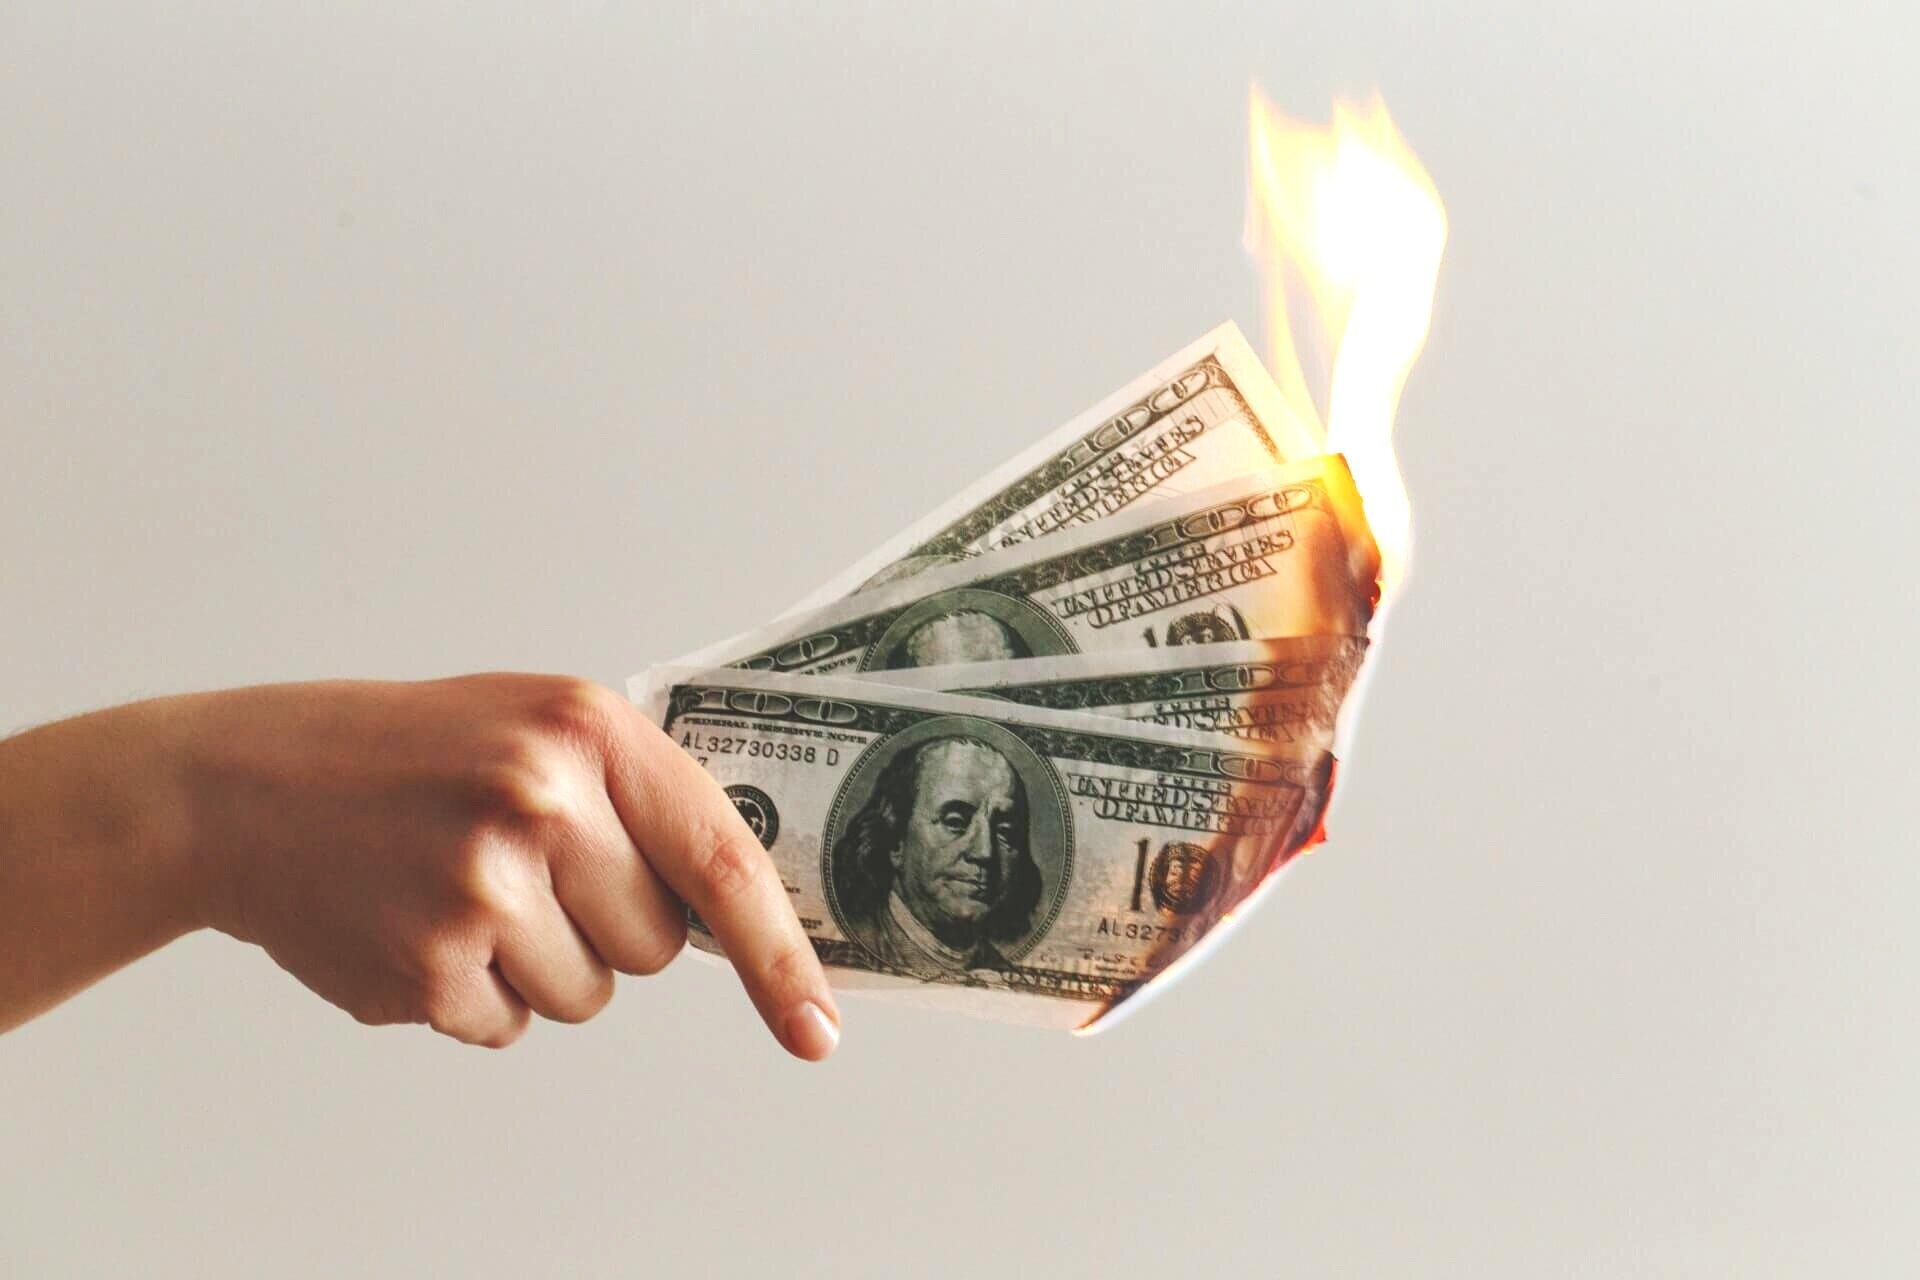 minimalray-money-problems-jp-valery.jpg